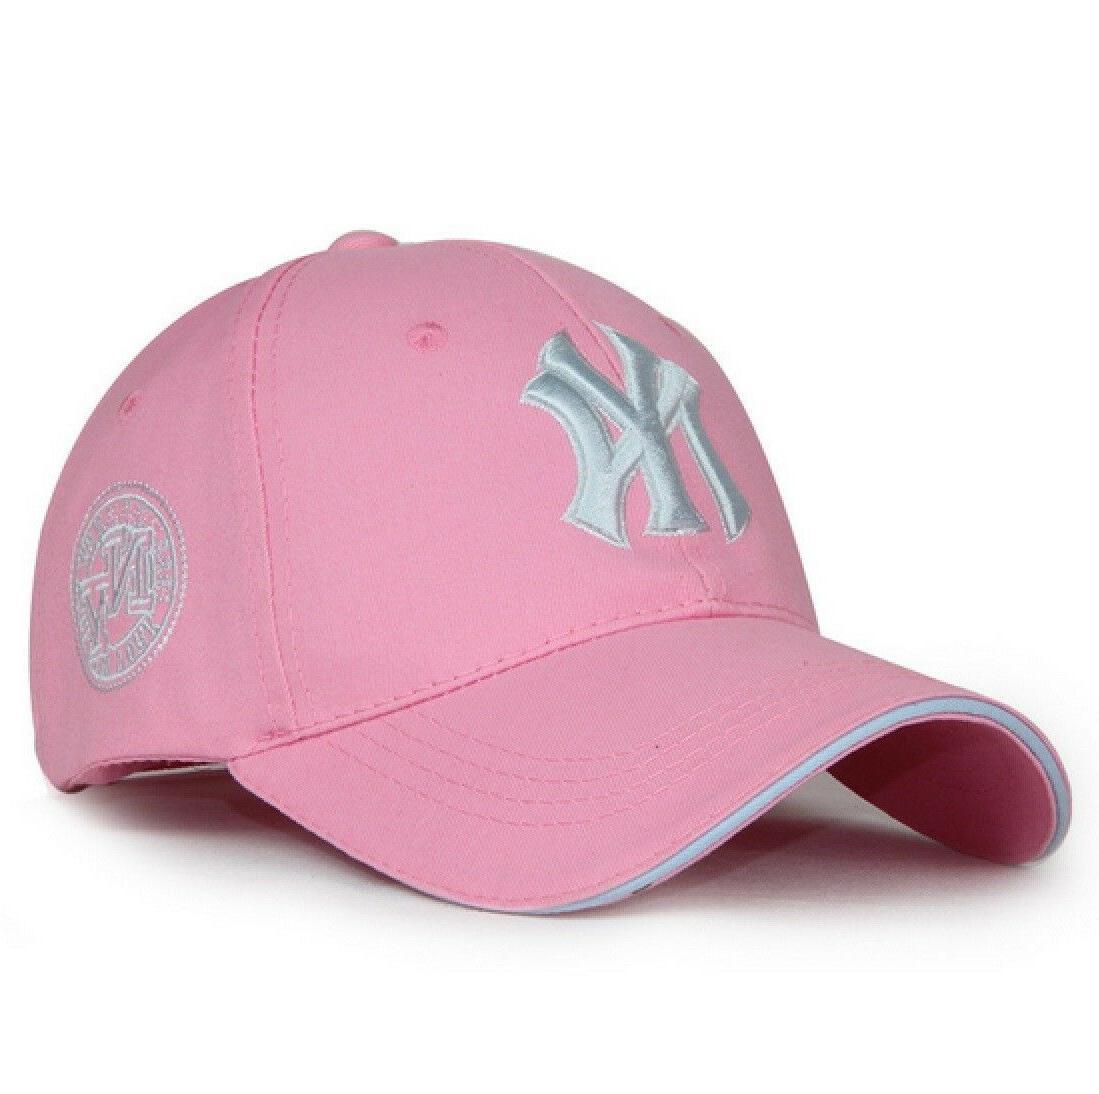 New York Yankees Adjustable MLB NY Hat Men